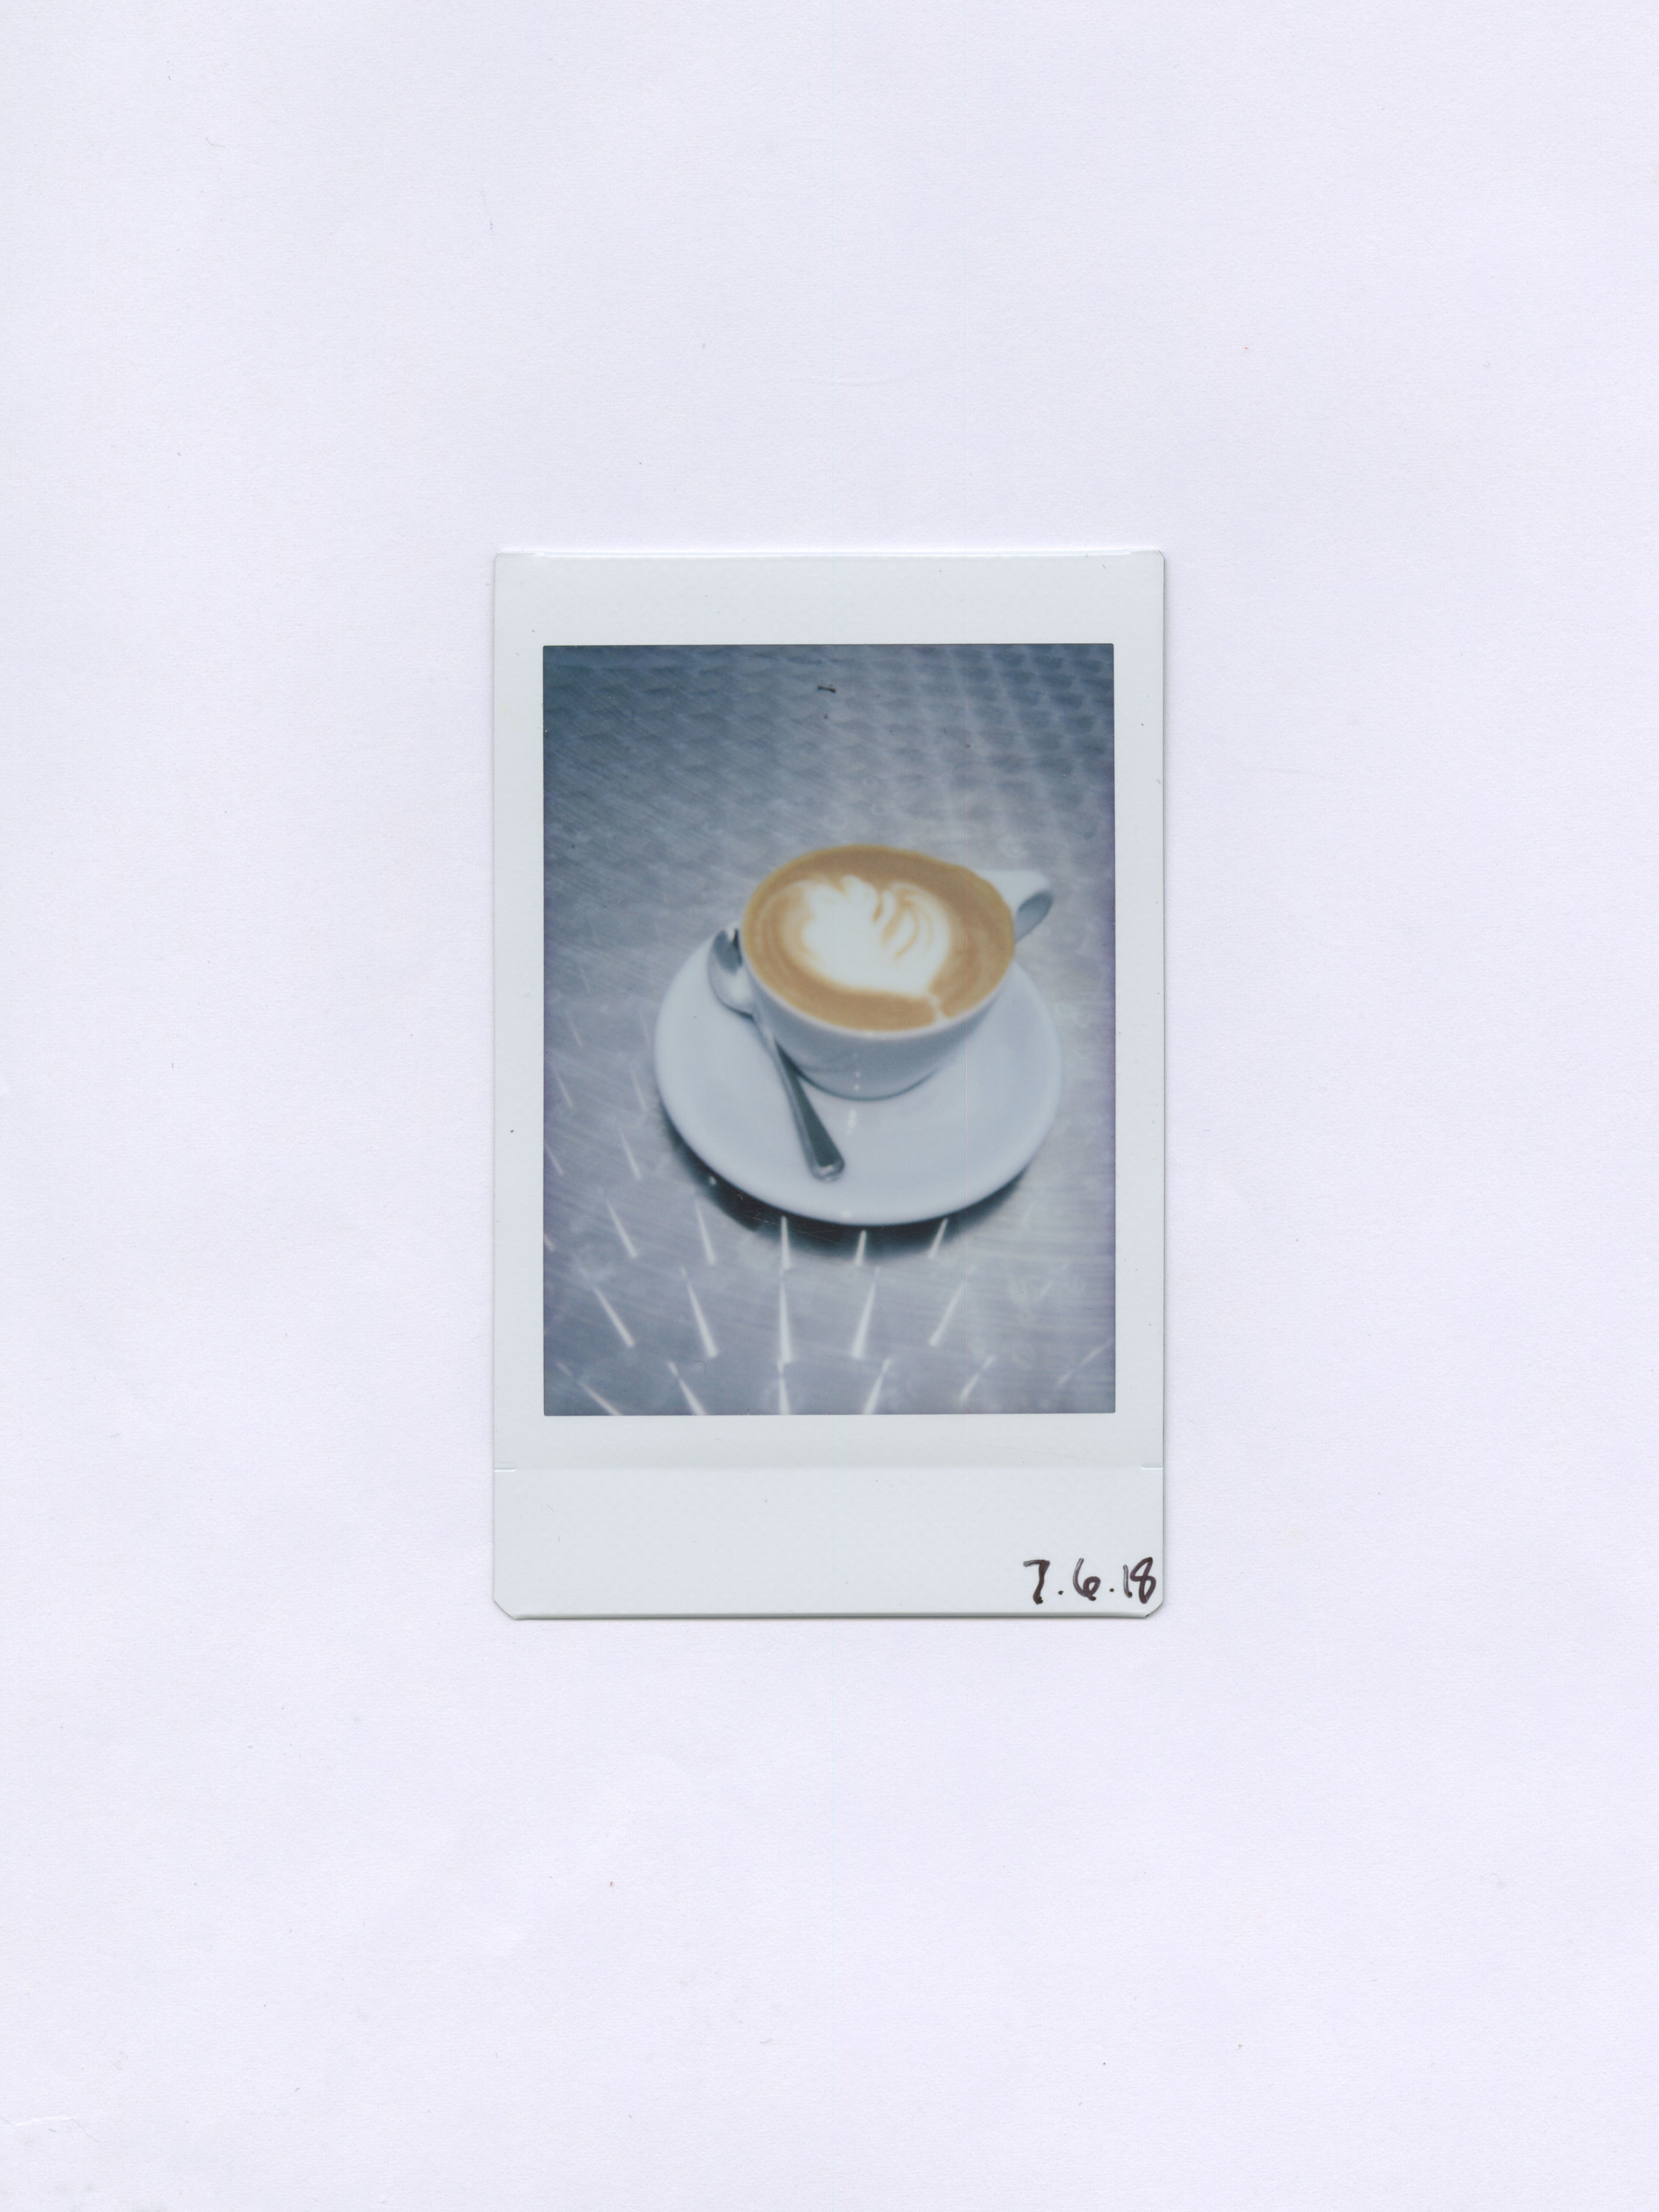 7.6.18A.jpg